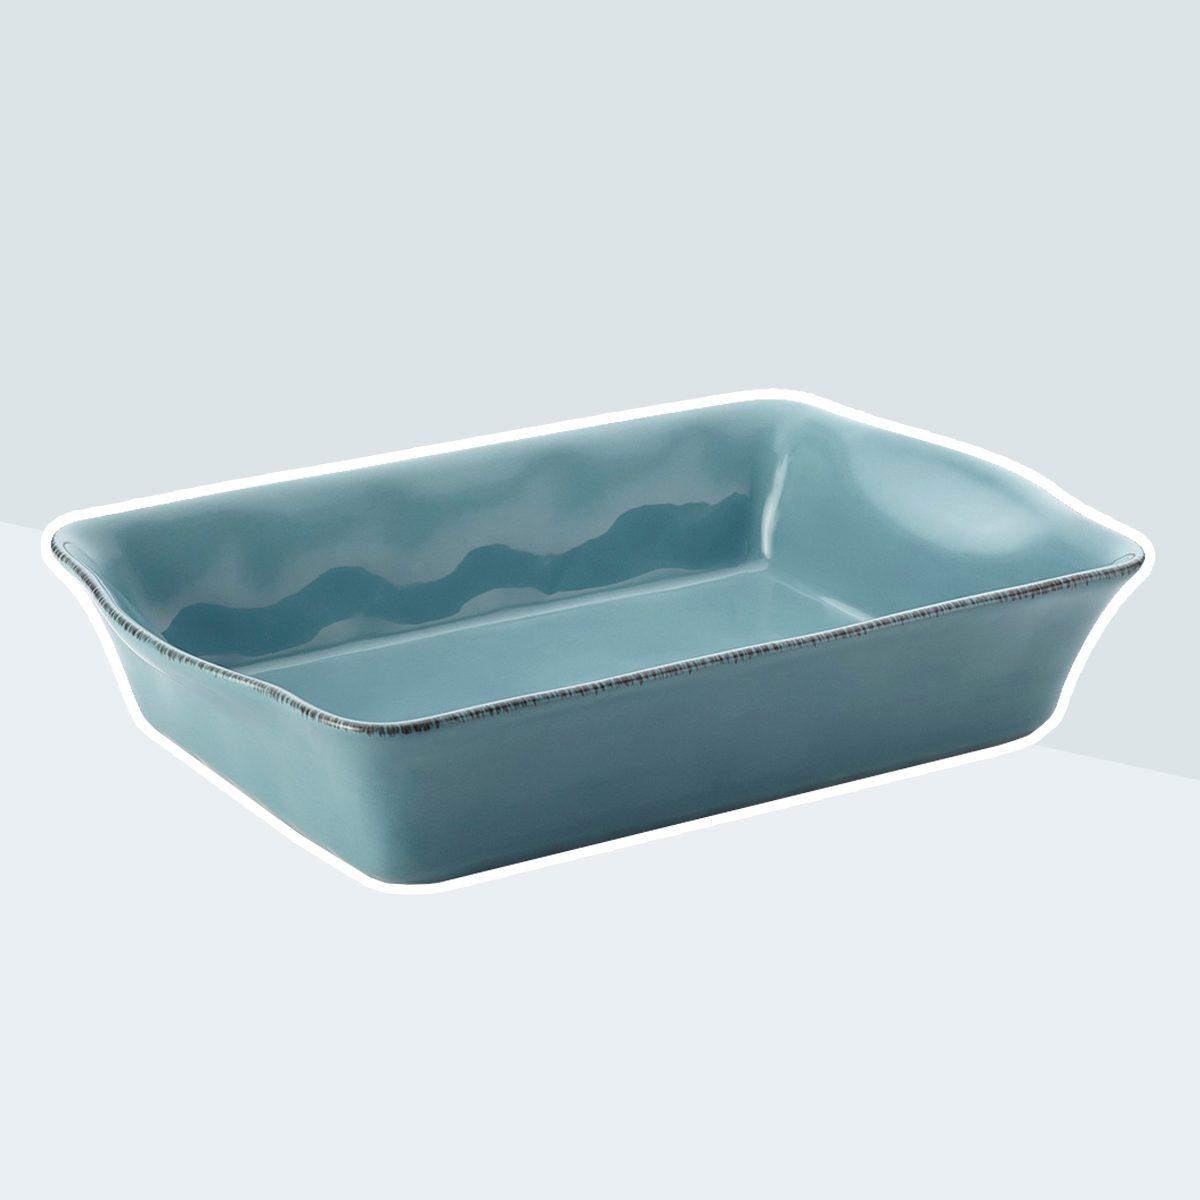 "rachel ray Cucina Stoneware 9"" x 13"" Rectangular Baker"